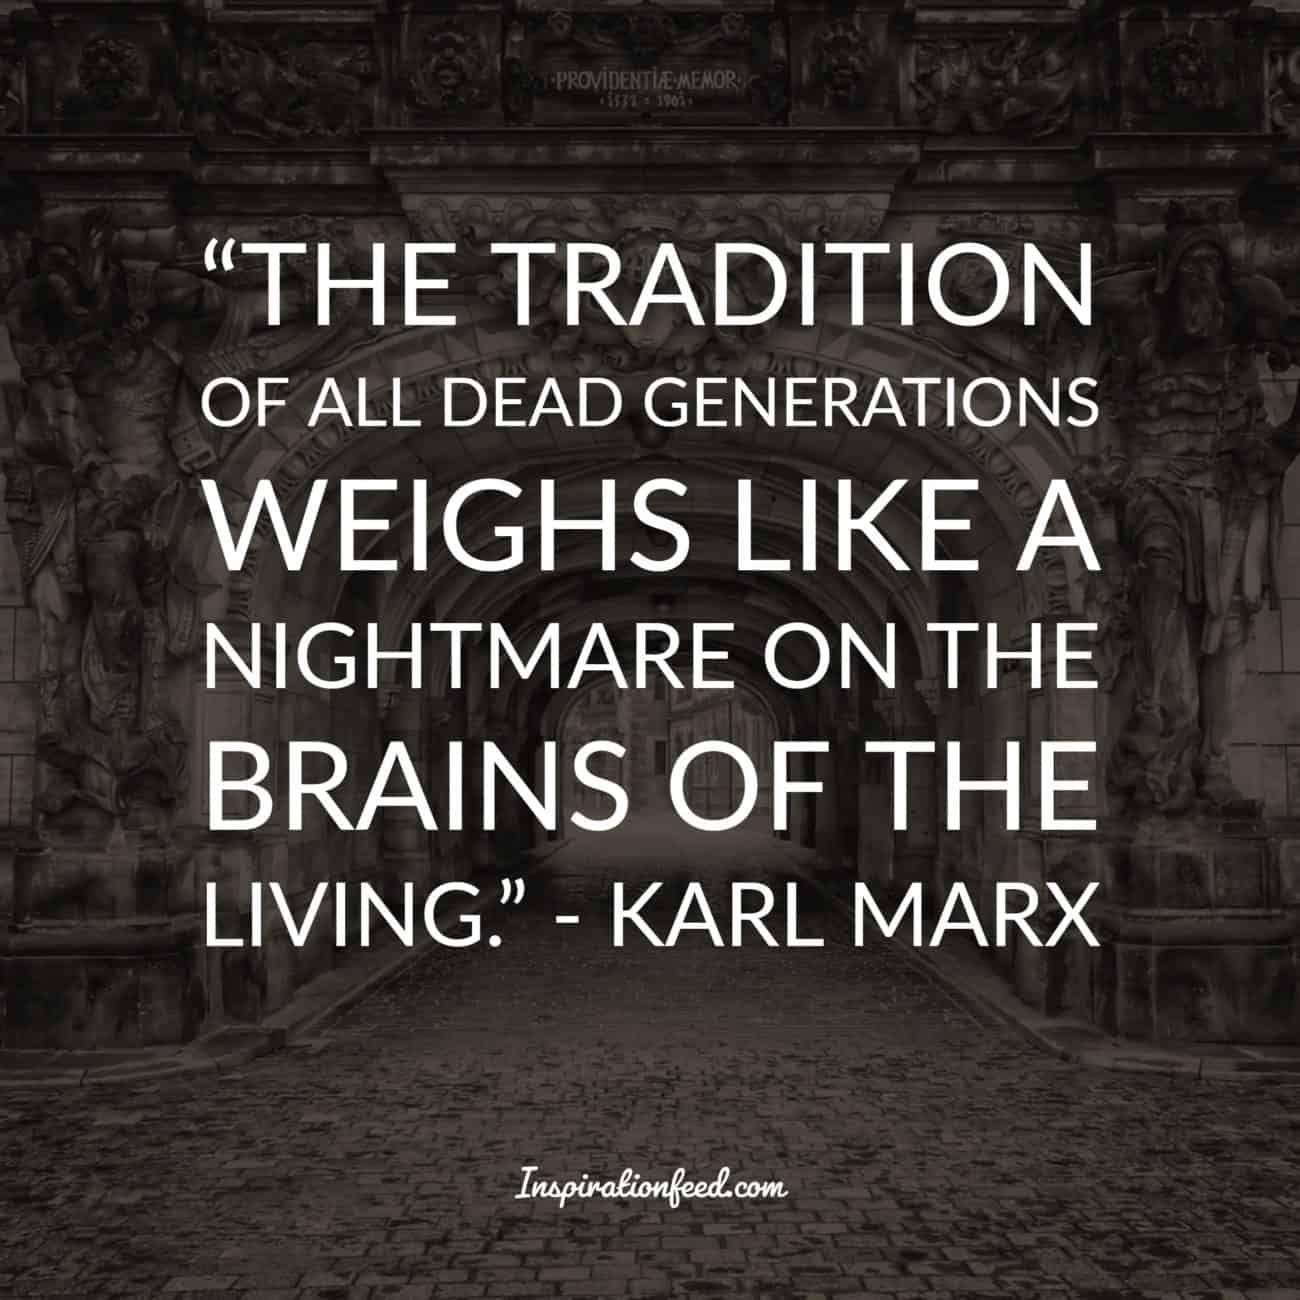 Karl Marx Quotes Karl Marx Quotes Leadership